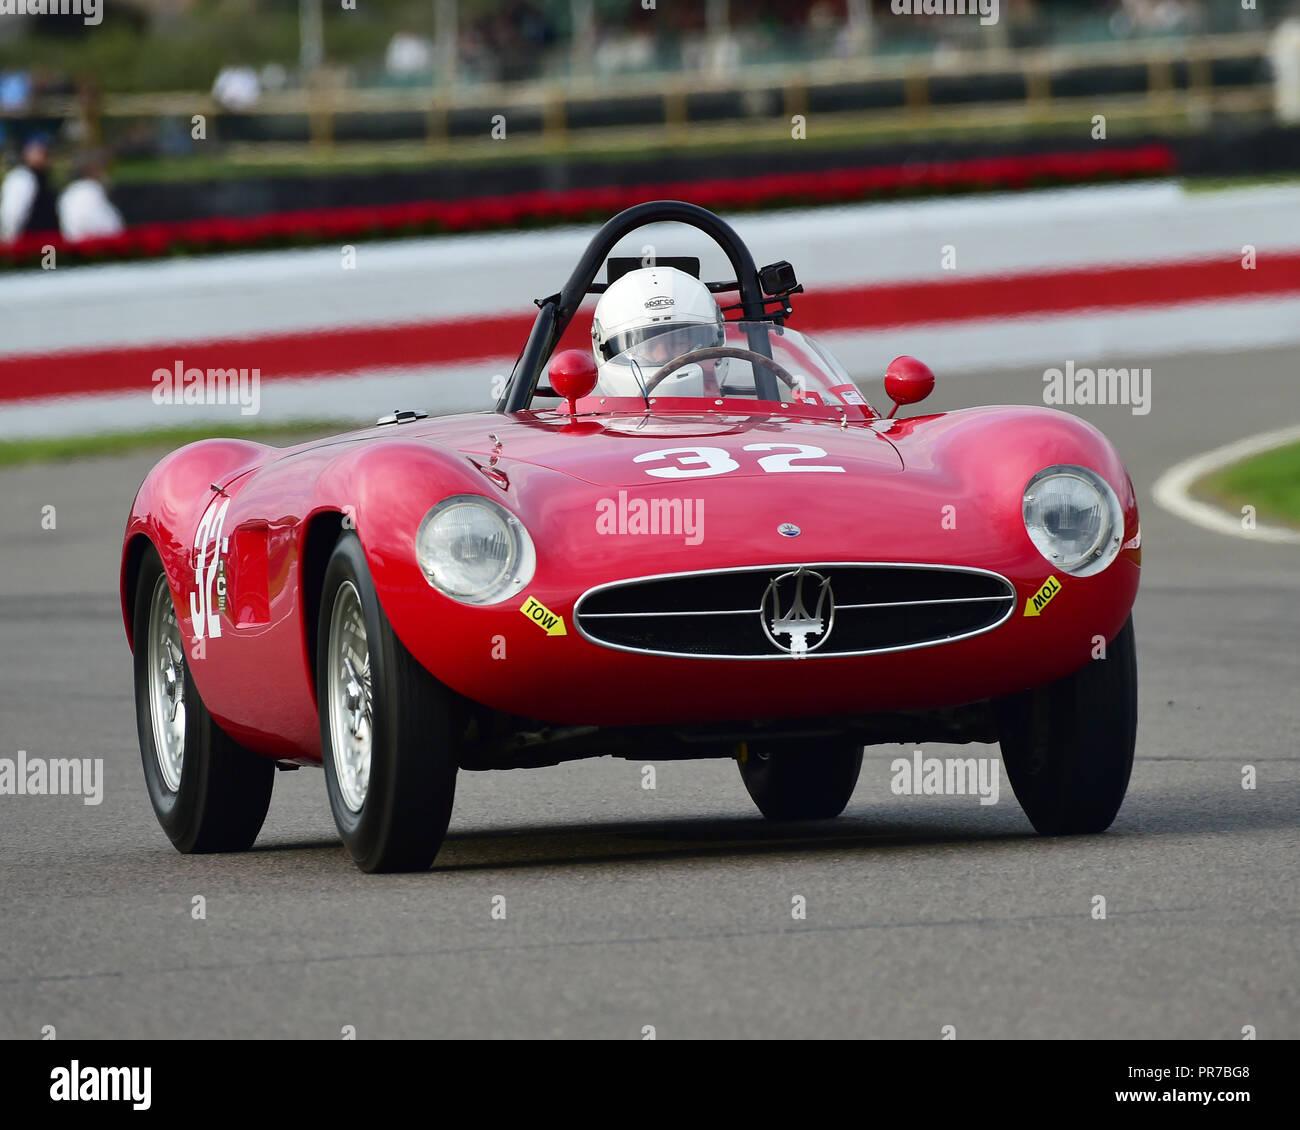 Carlos Sielecki, Maserati A6GCS, Freddie März Memorial Trophy, Sportwagen, 1952 bis 1955, Goodwood Revival 2018, September 2018, Automobile, Autos, c Stockbild